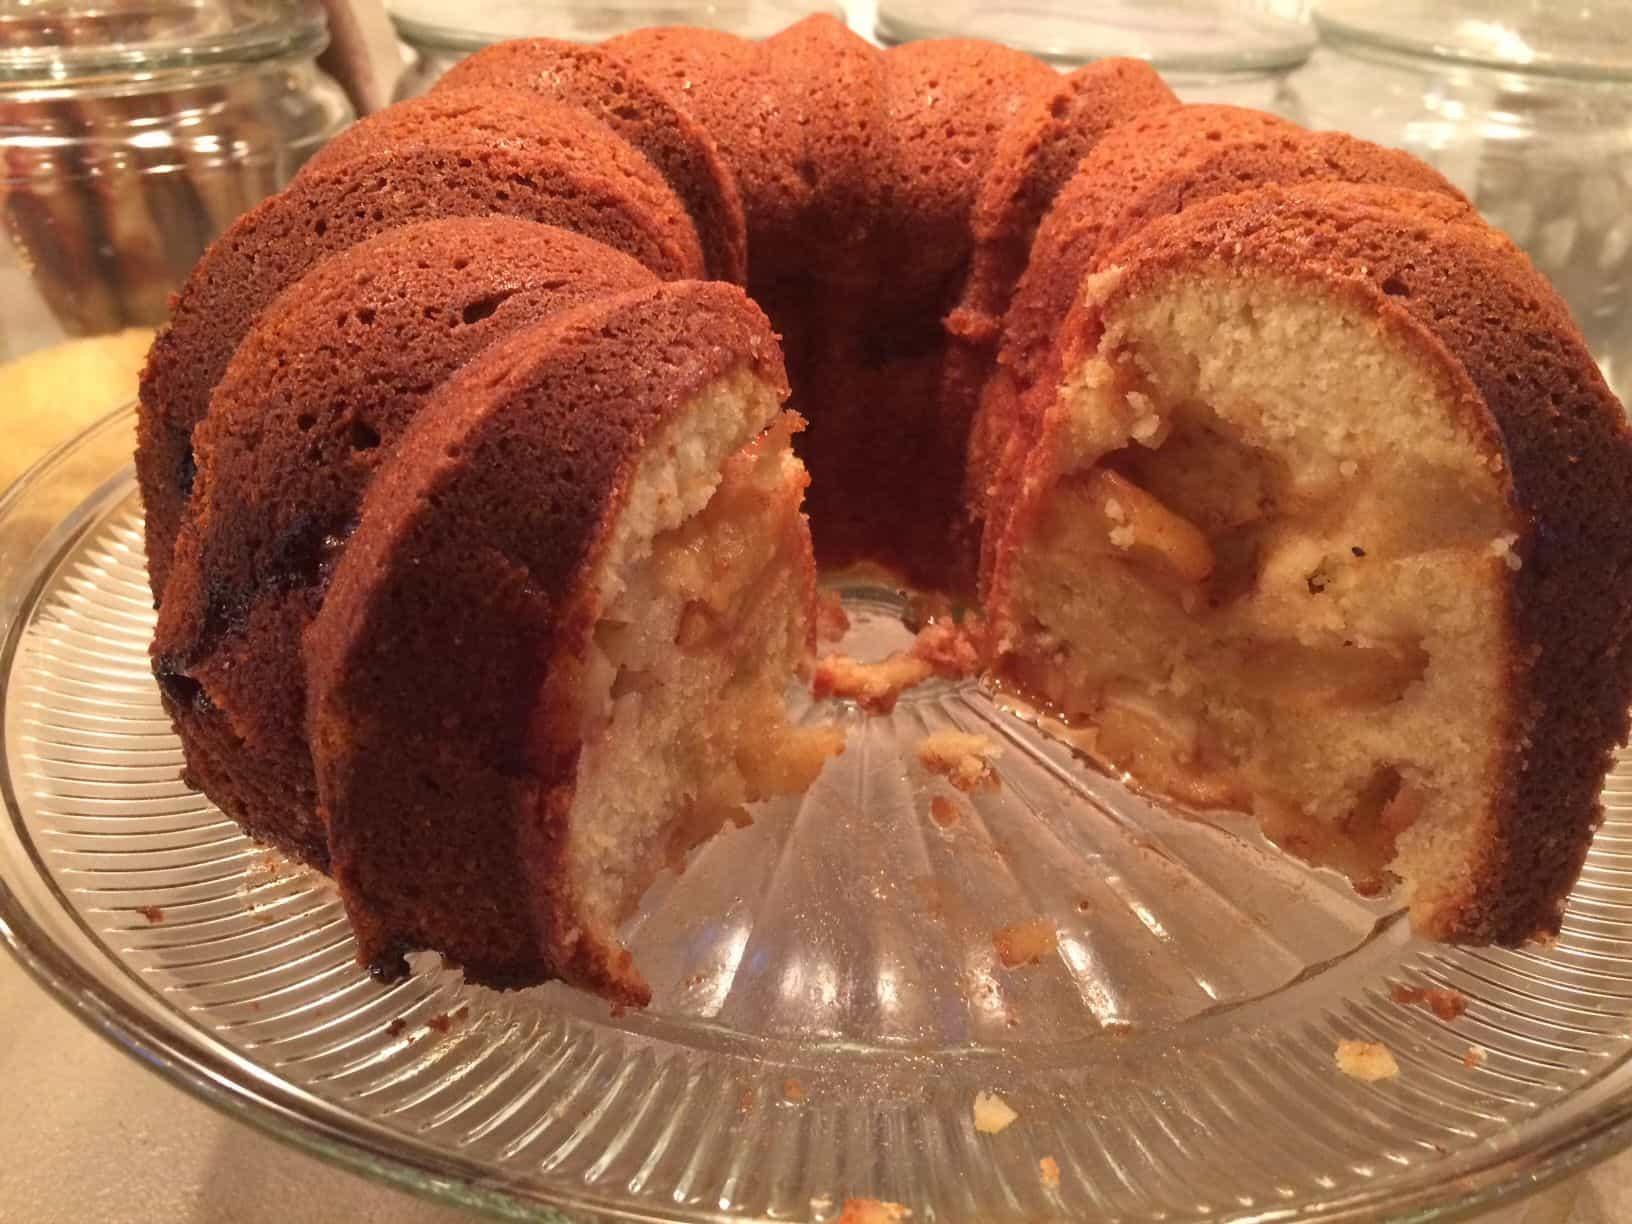 Apple Bundt Cake  Apple Bundt Cake Chocolate Chocolate and More